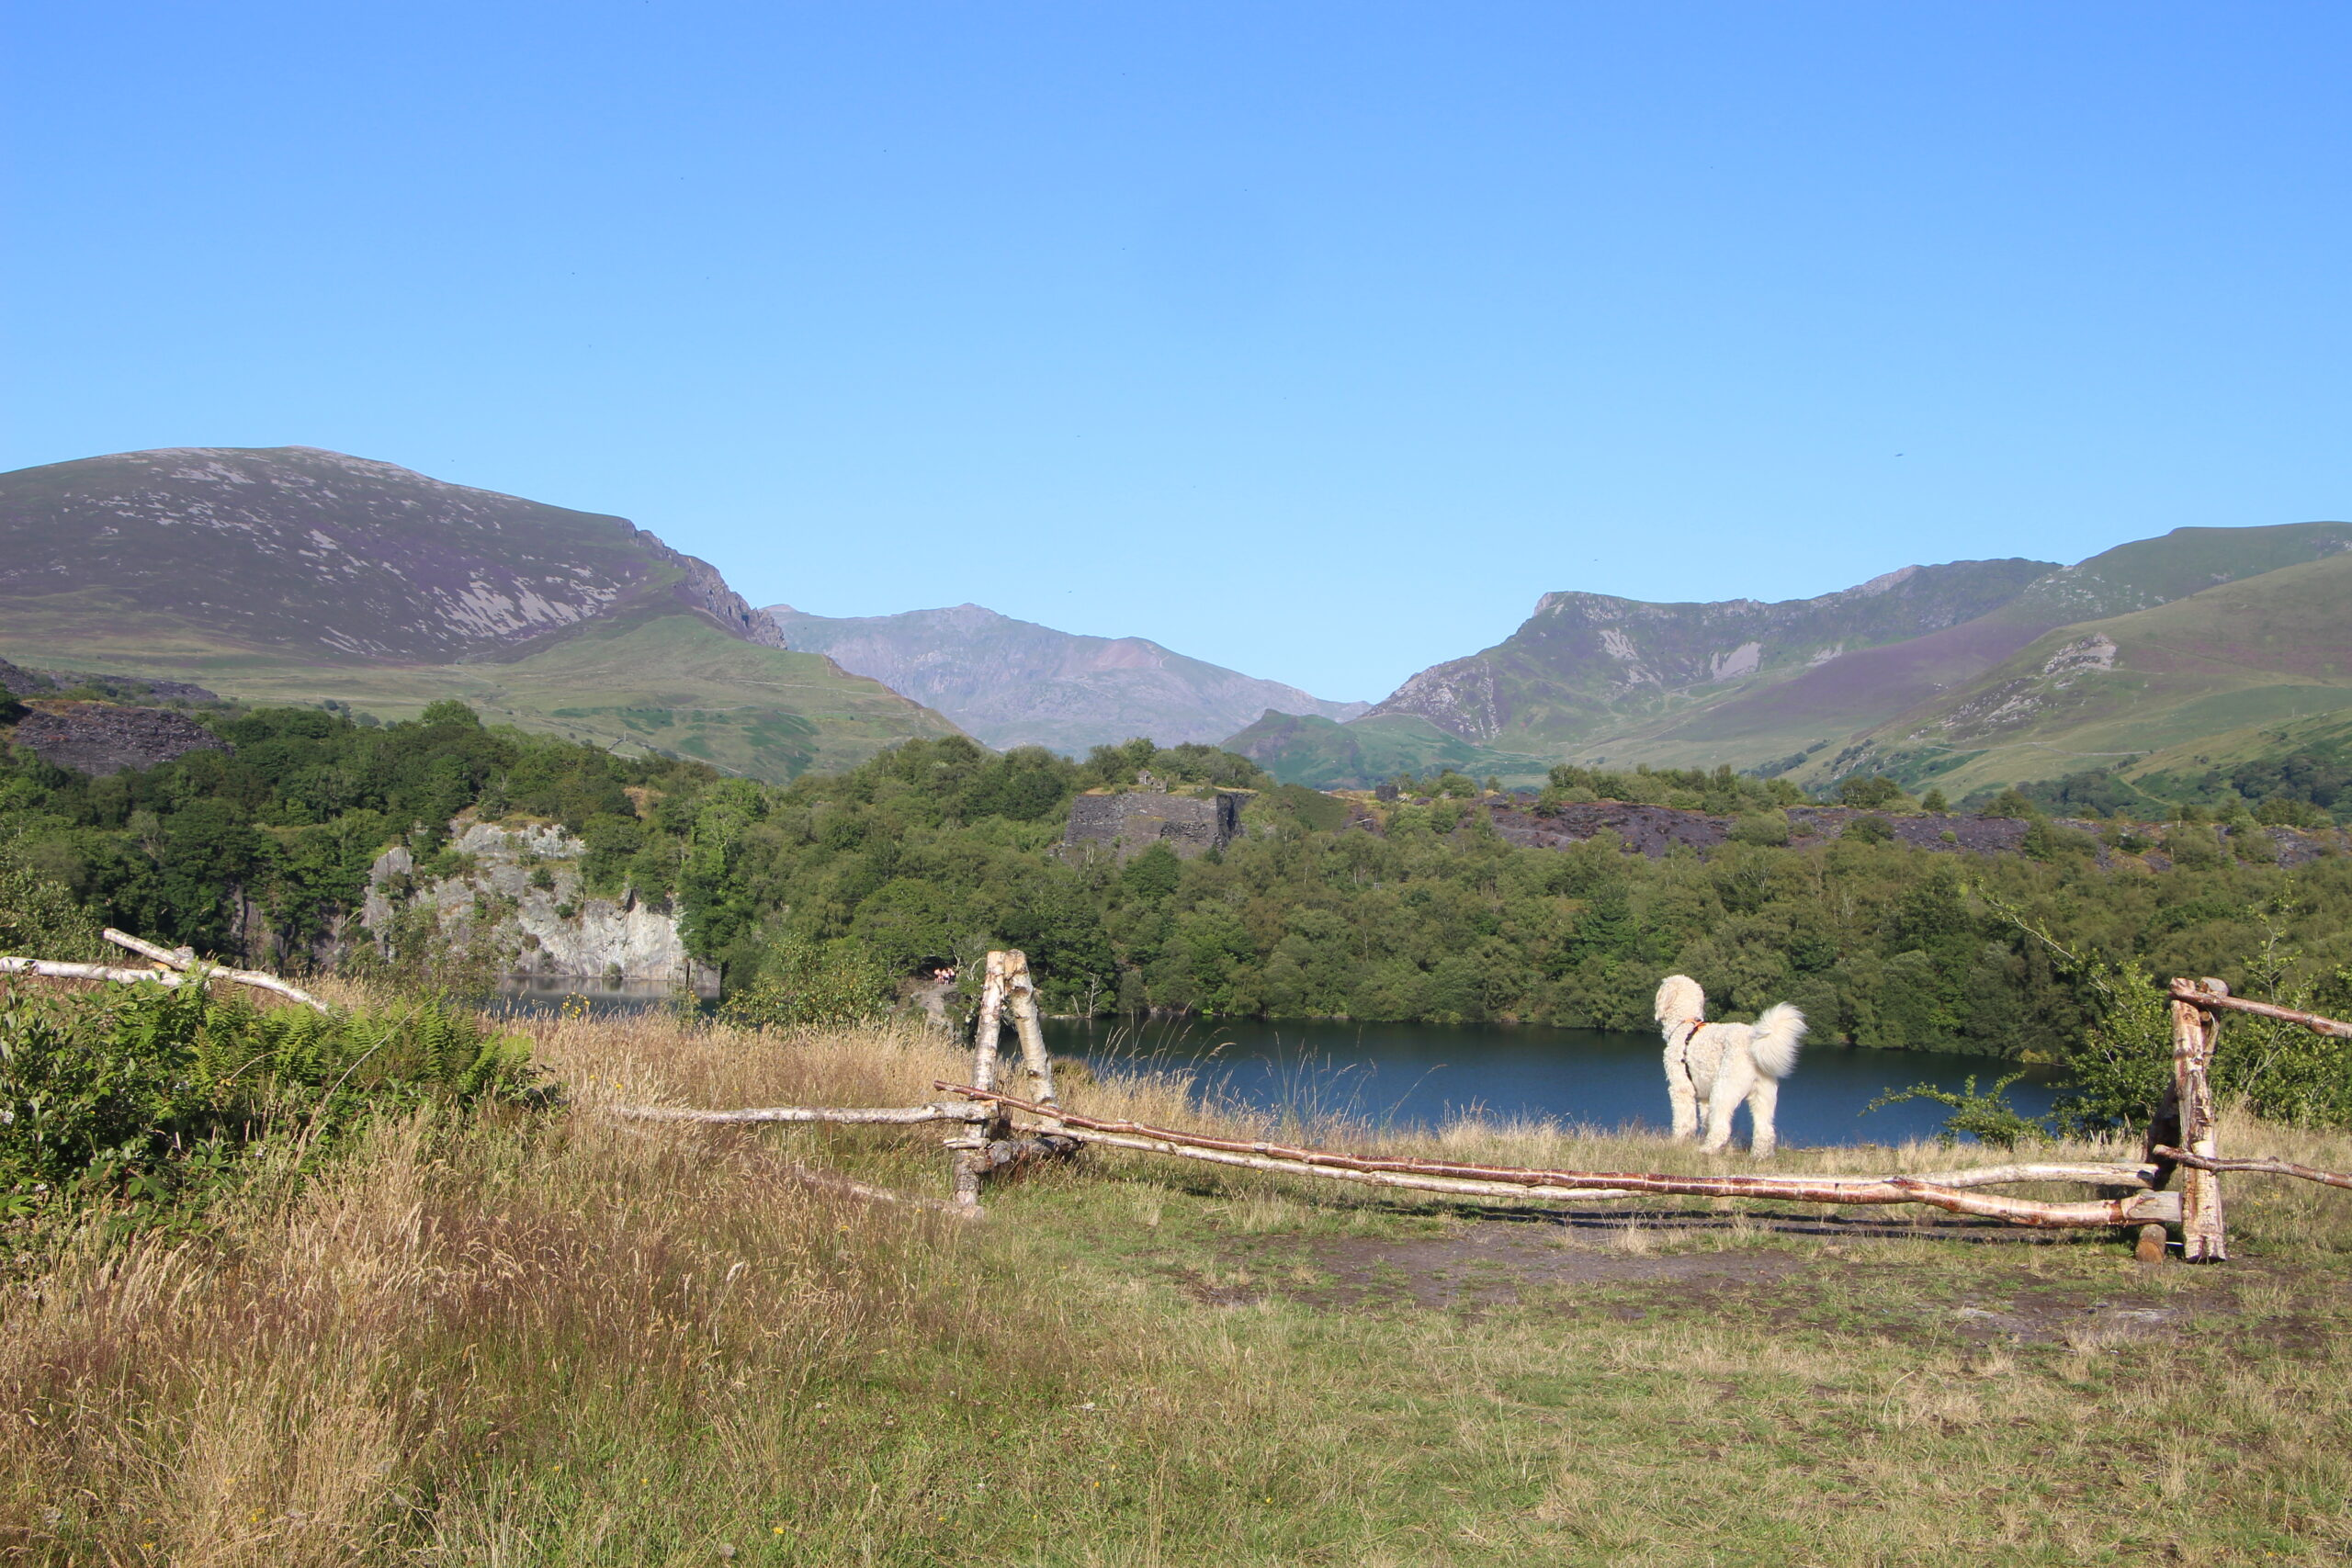 view of Dorothea quarry